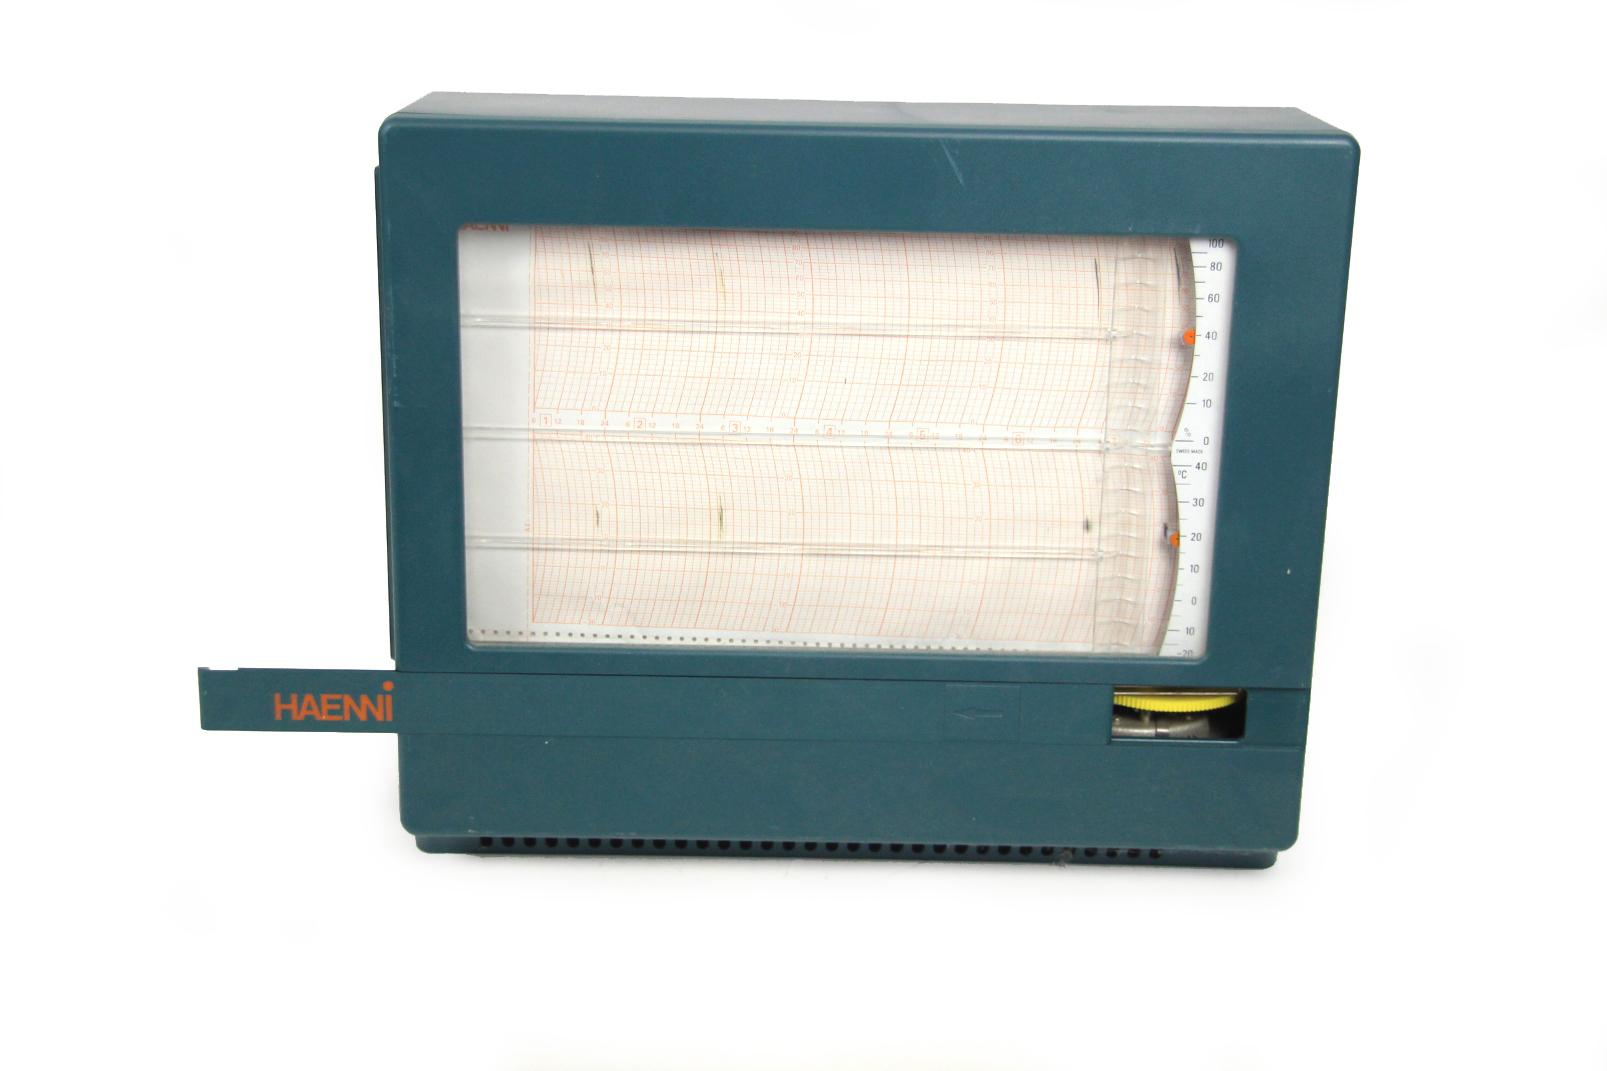 haenni thermo hygrograph 7 tage 24h wetterstation temperatur trommel schreiber ebay. Black Bedroom Furniture Sets. Home Design Ideas